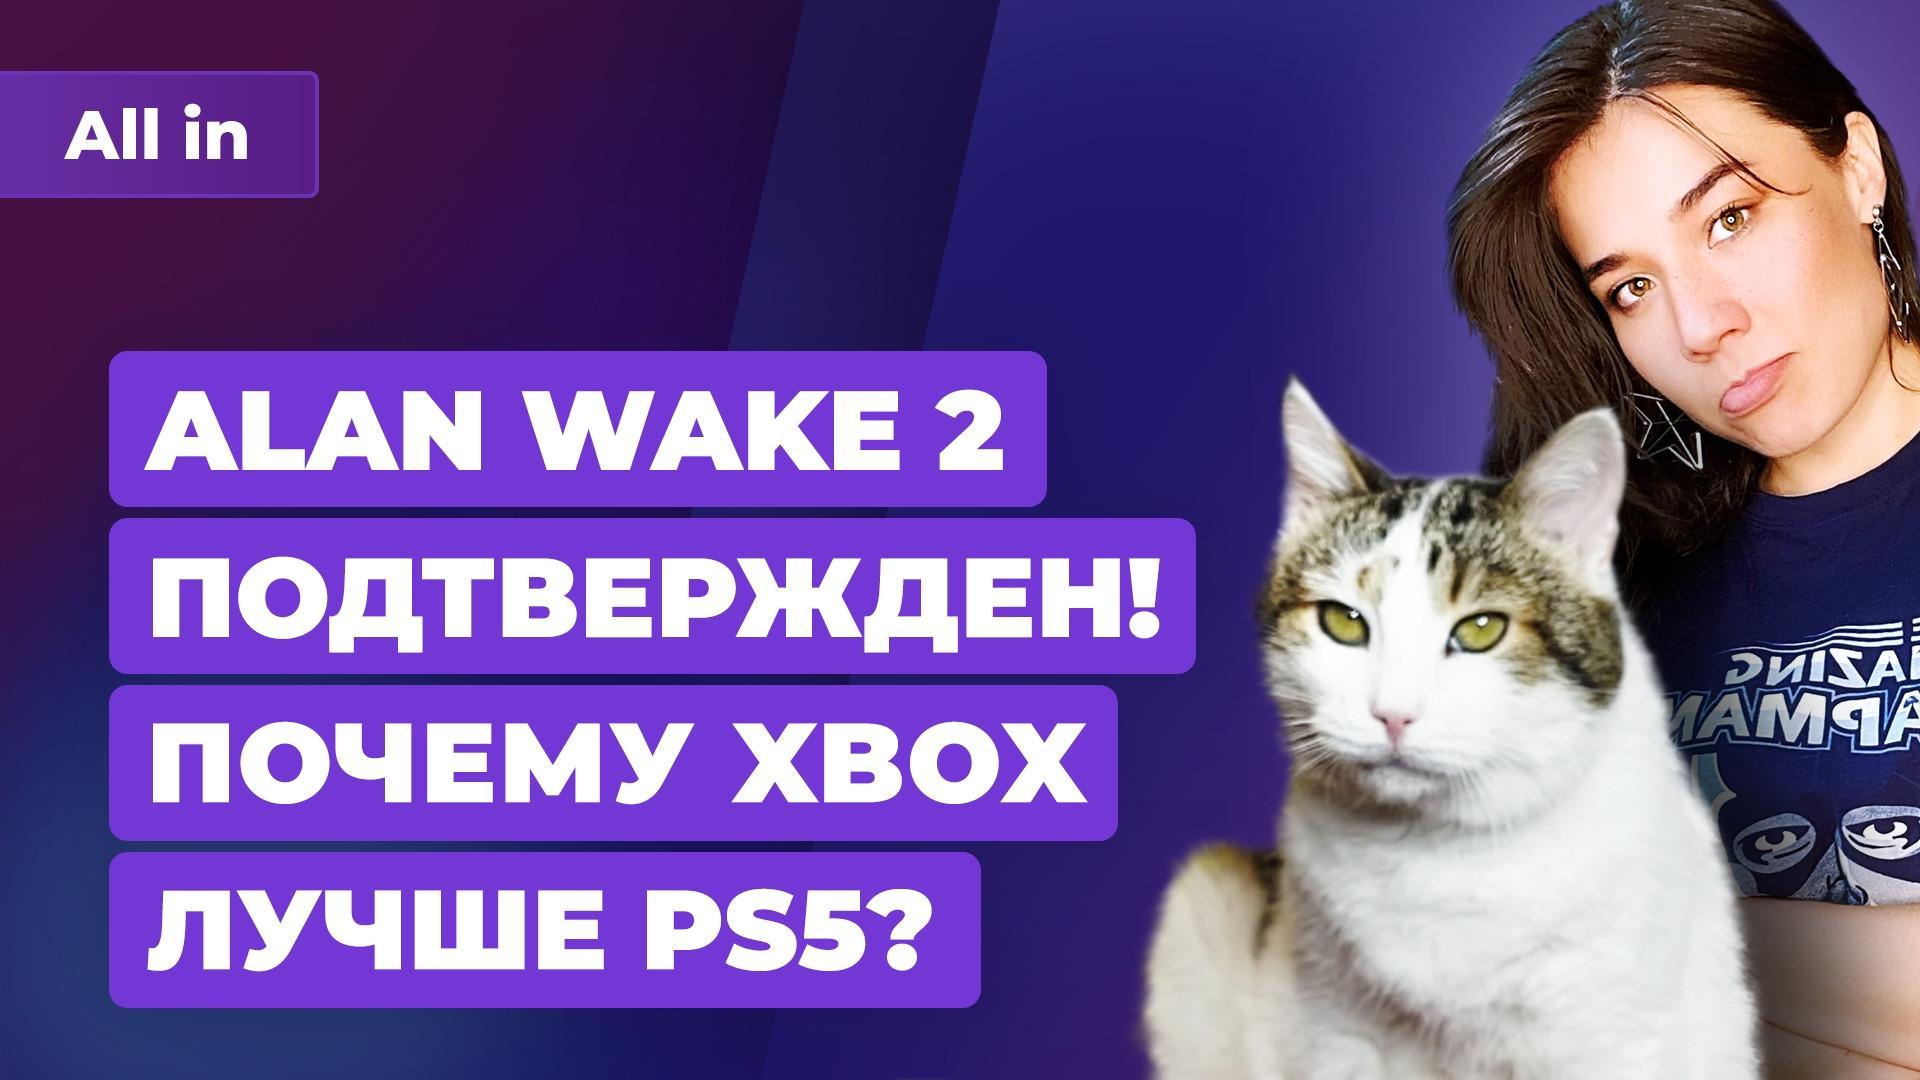 Alan Wake2, детали Dying Light2, PS5 vs Xbox, падение CD Projekt! Игровые новости ALL IN за1.04